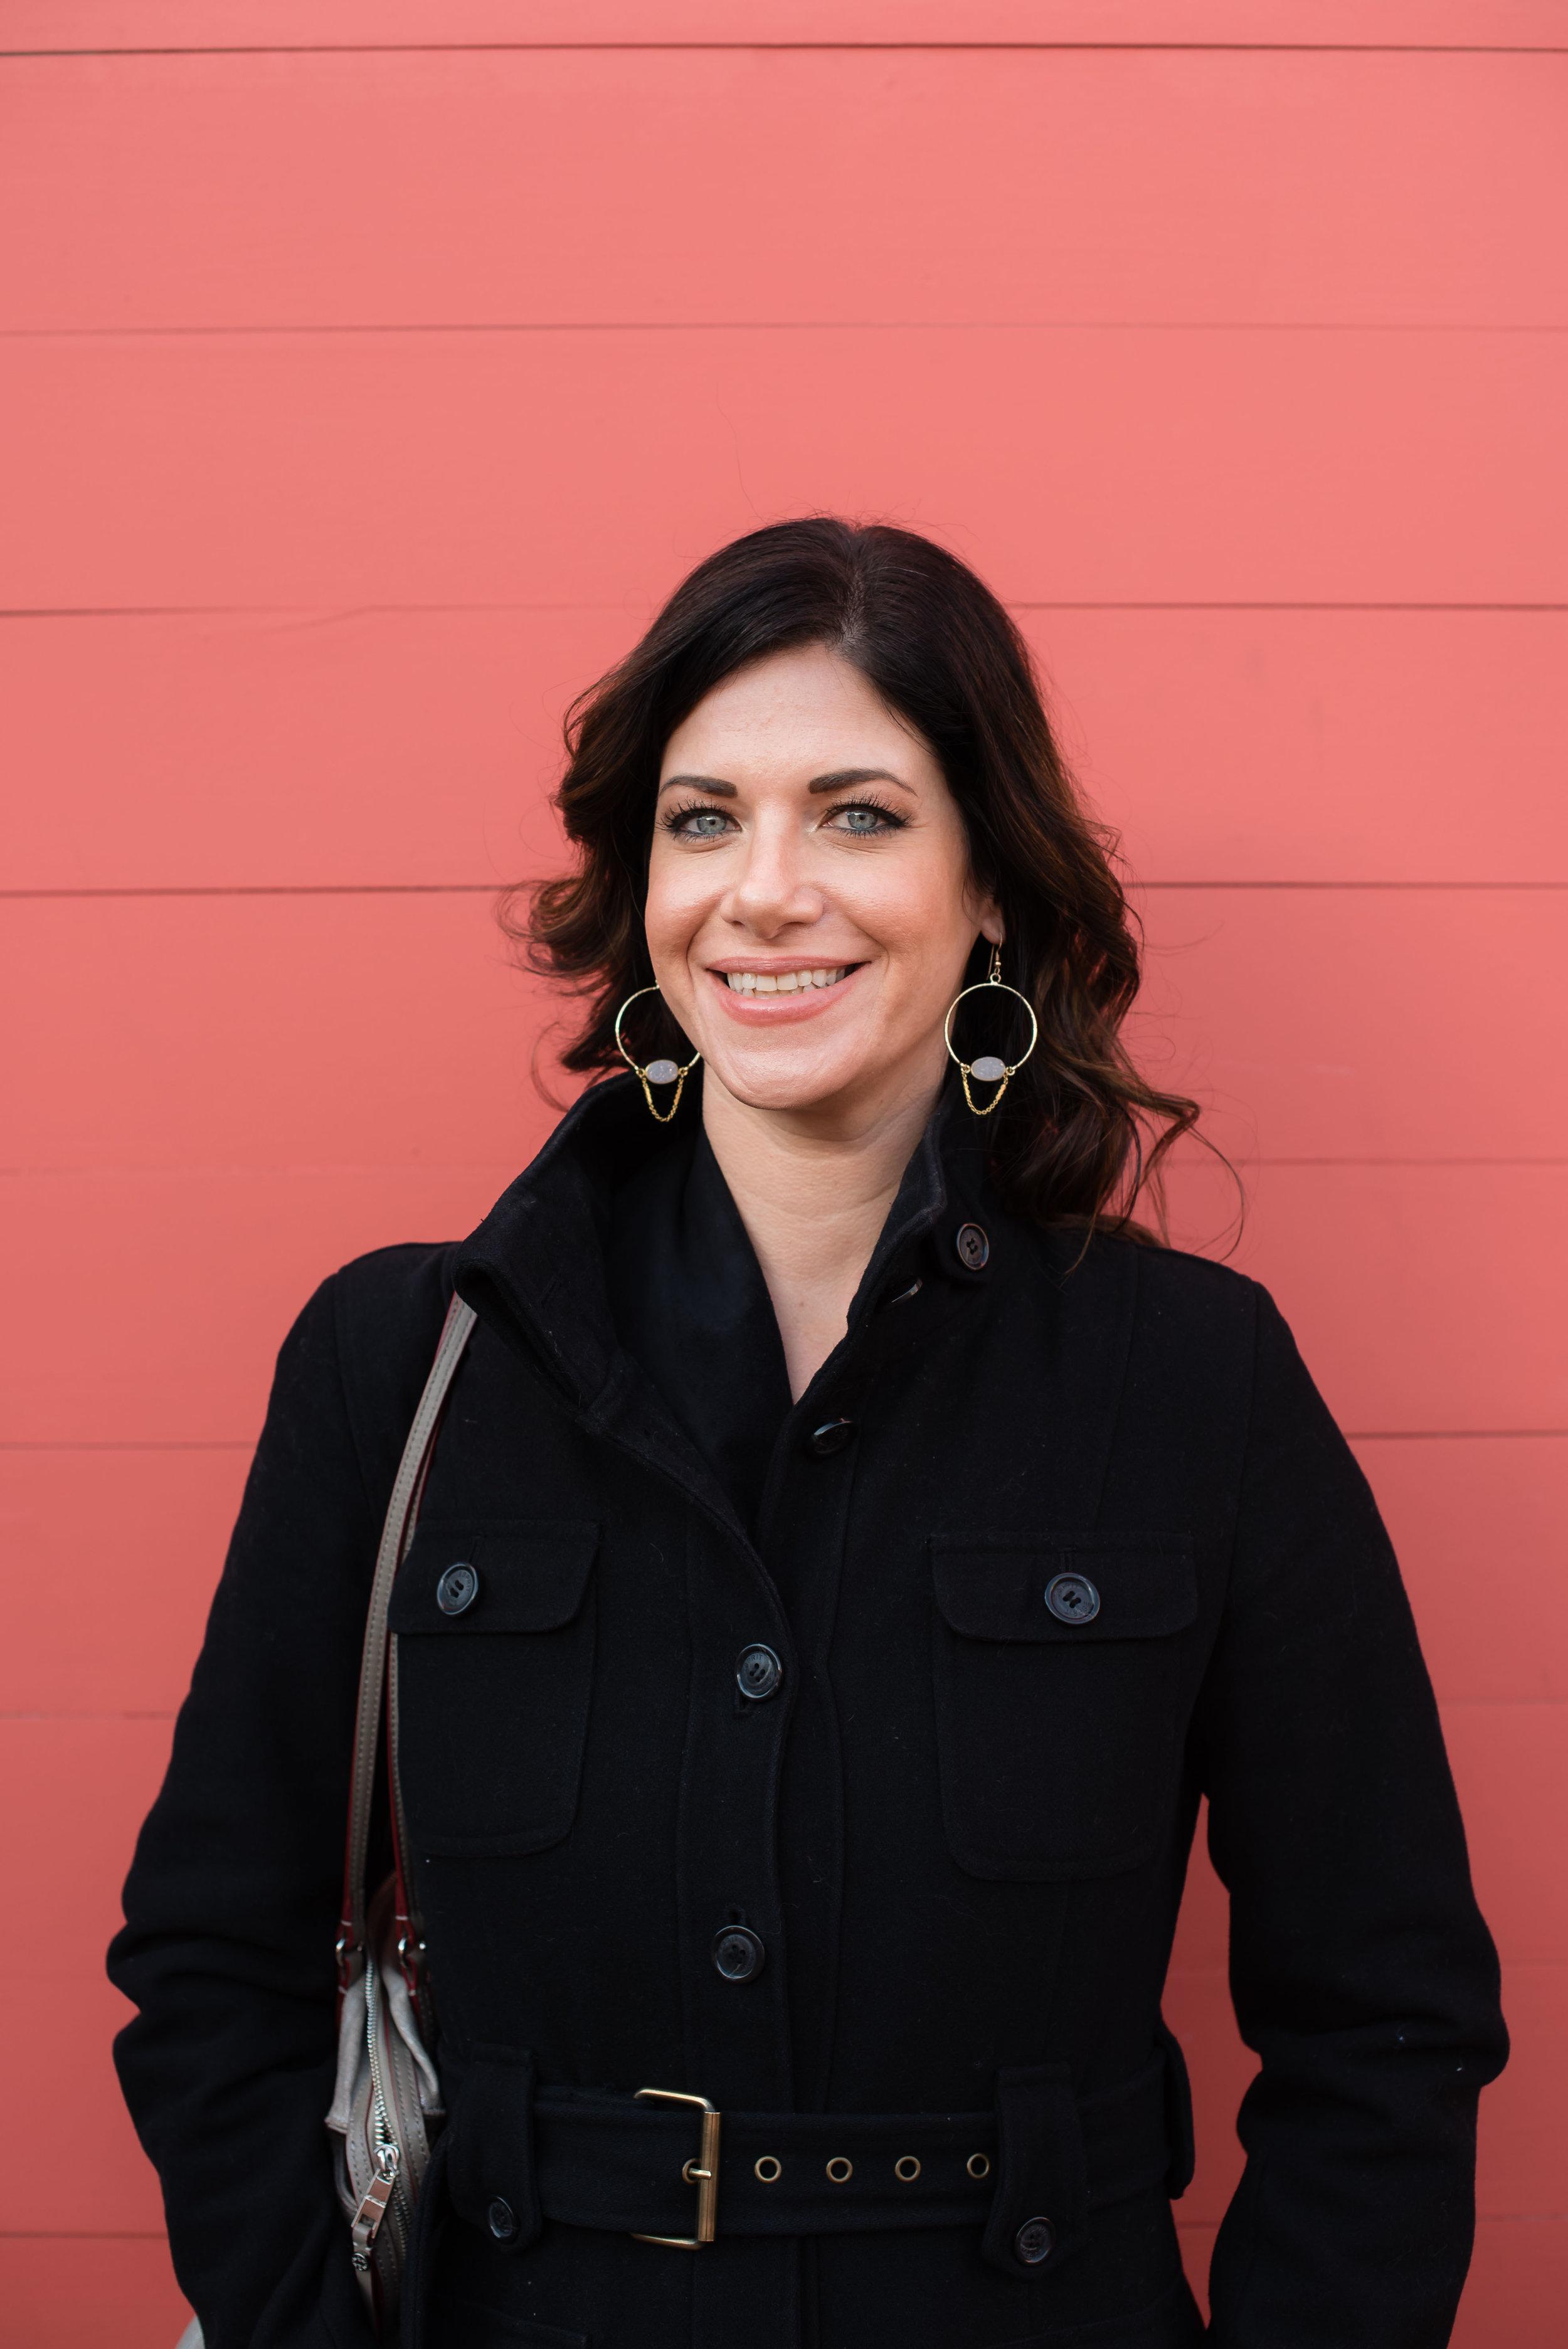 Erin-Kirkpatrick-Photography-Amanda-Fischer-Headshots-Dec-2017-98.jpg